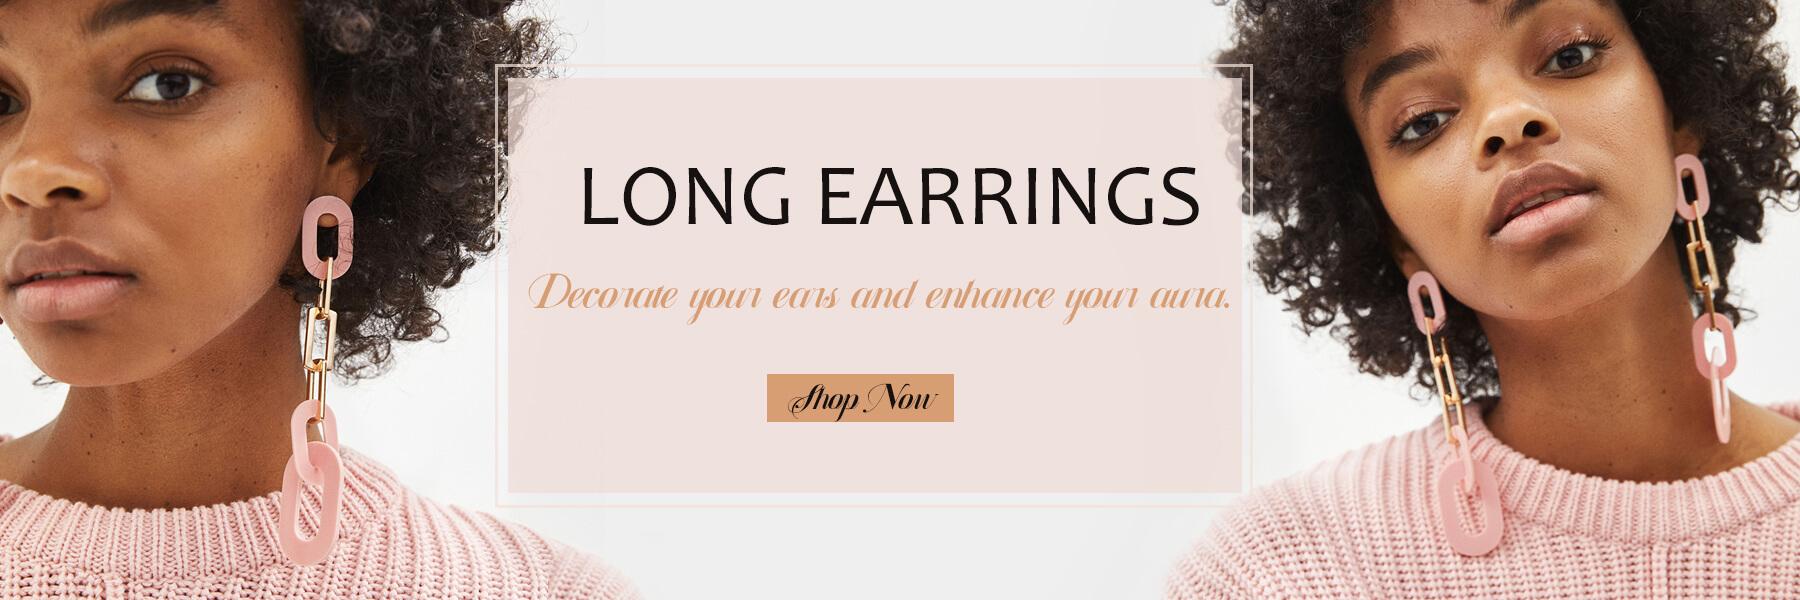 Wholesale Long Earrings